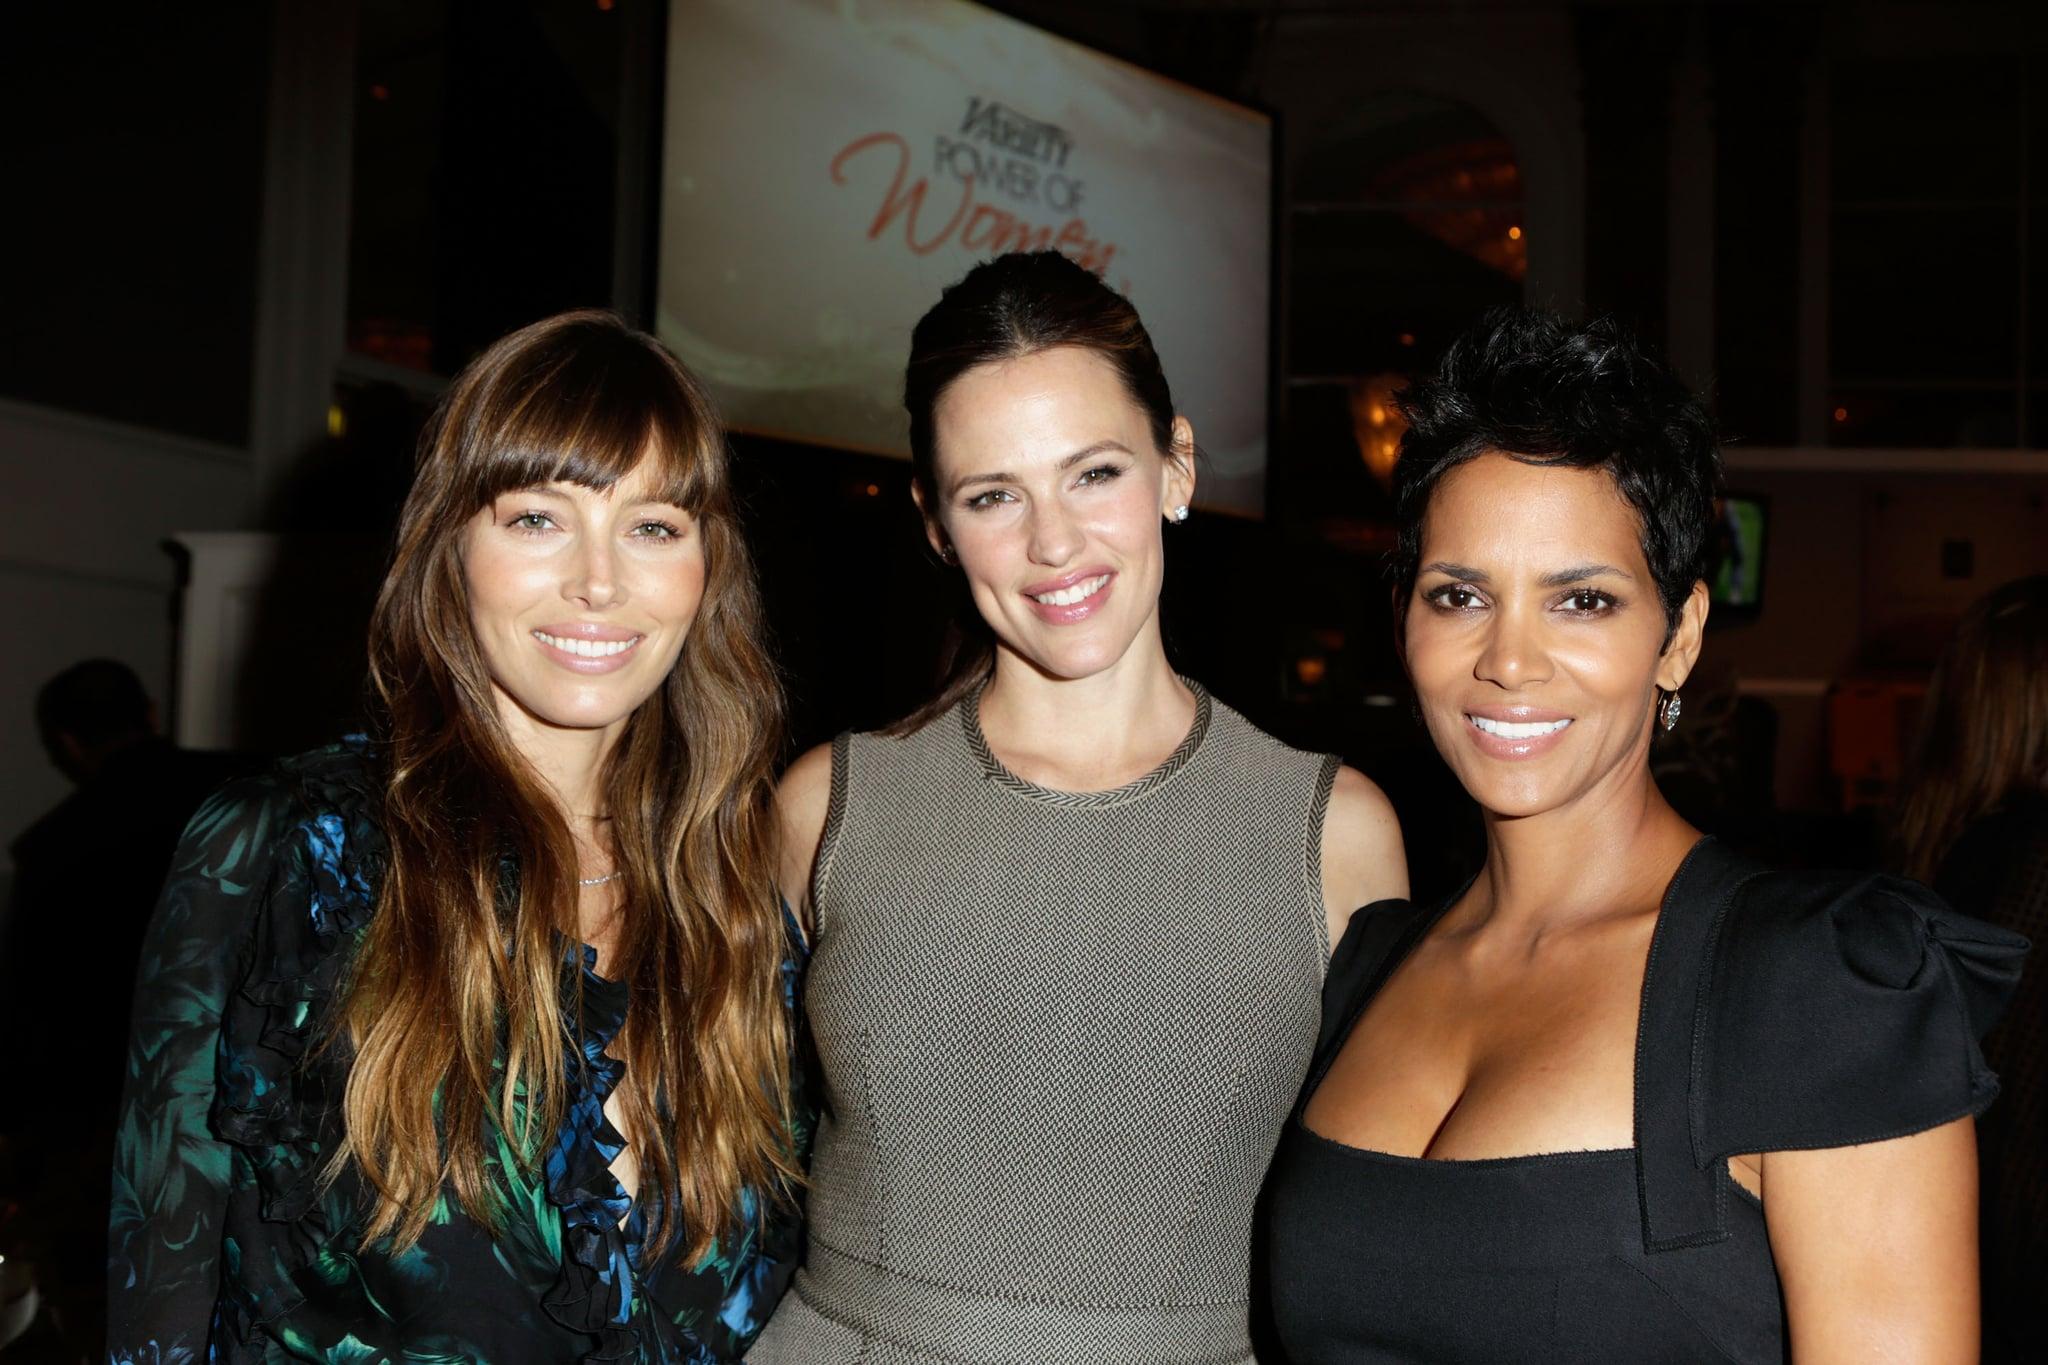 Jessica Biel posed with Jennifer Garner and Halle Berry.